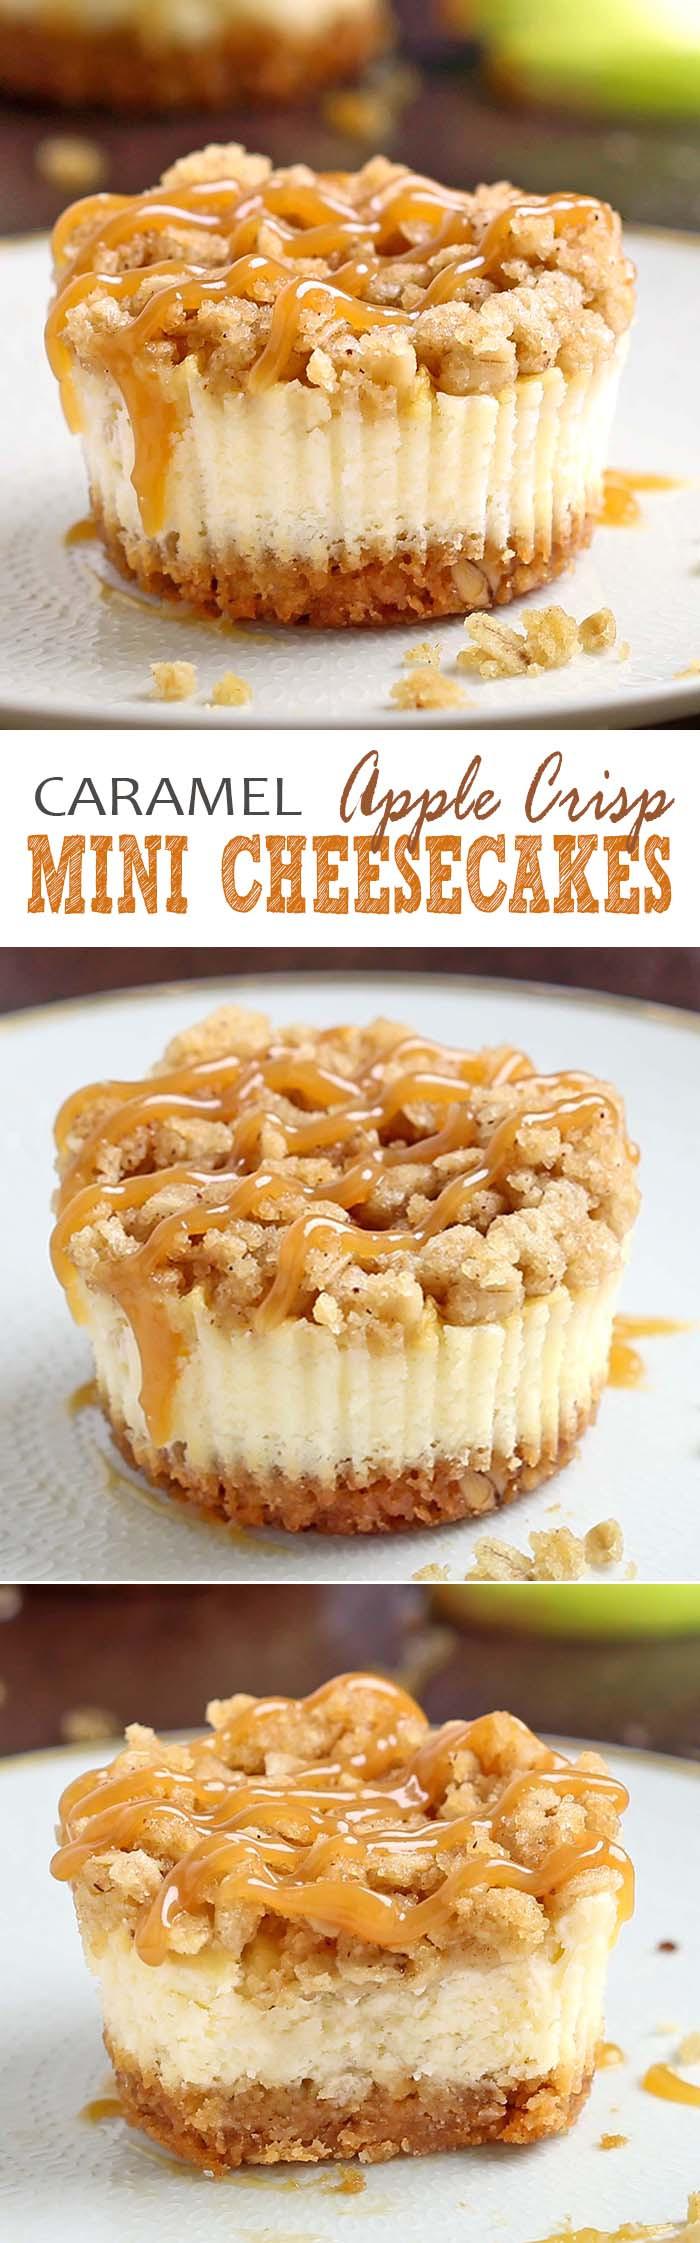 Caramel Apple Dessert  Caramel Apple Crisp Mini Cheesecakes Cakescottage